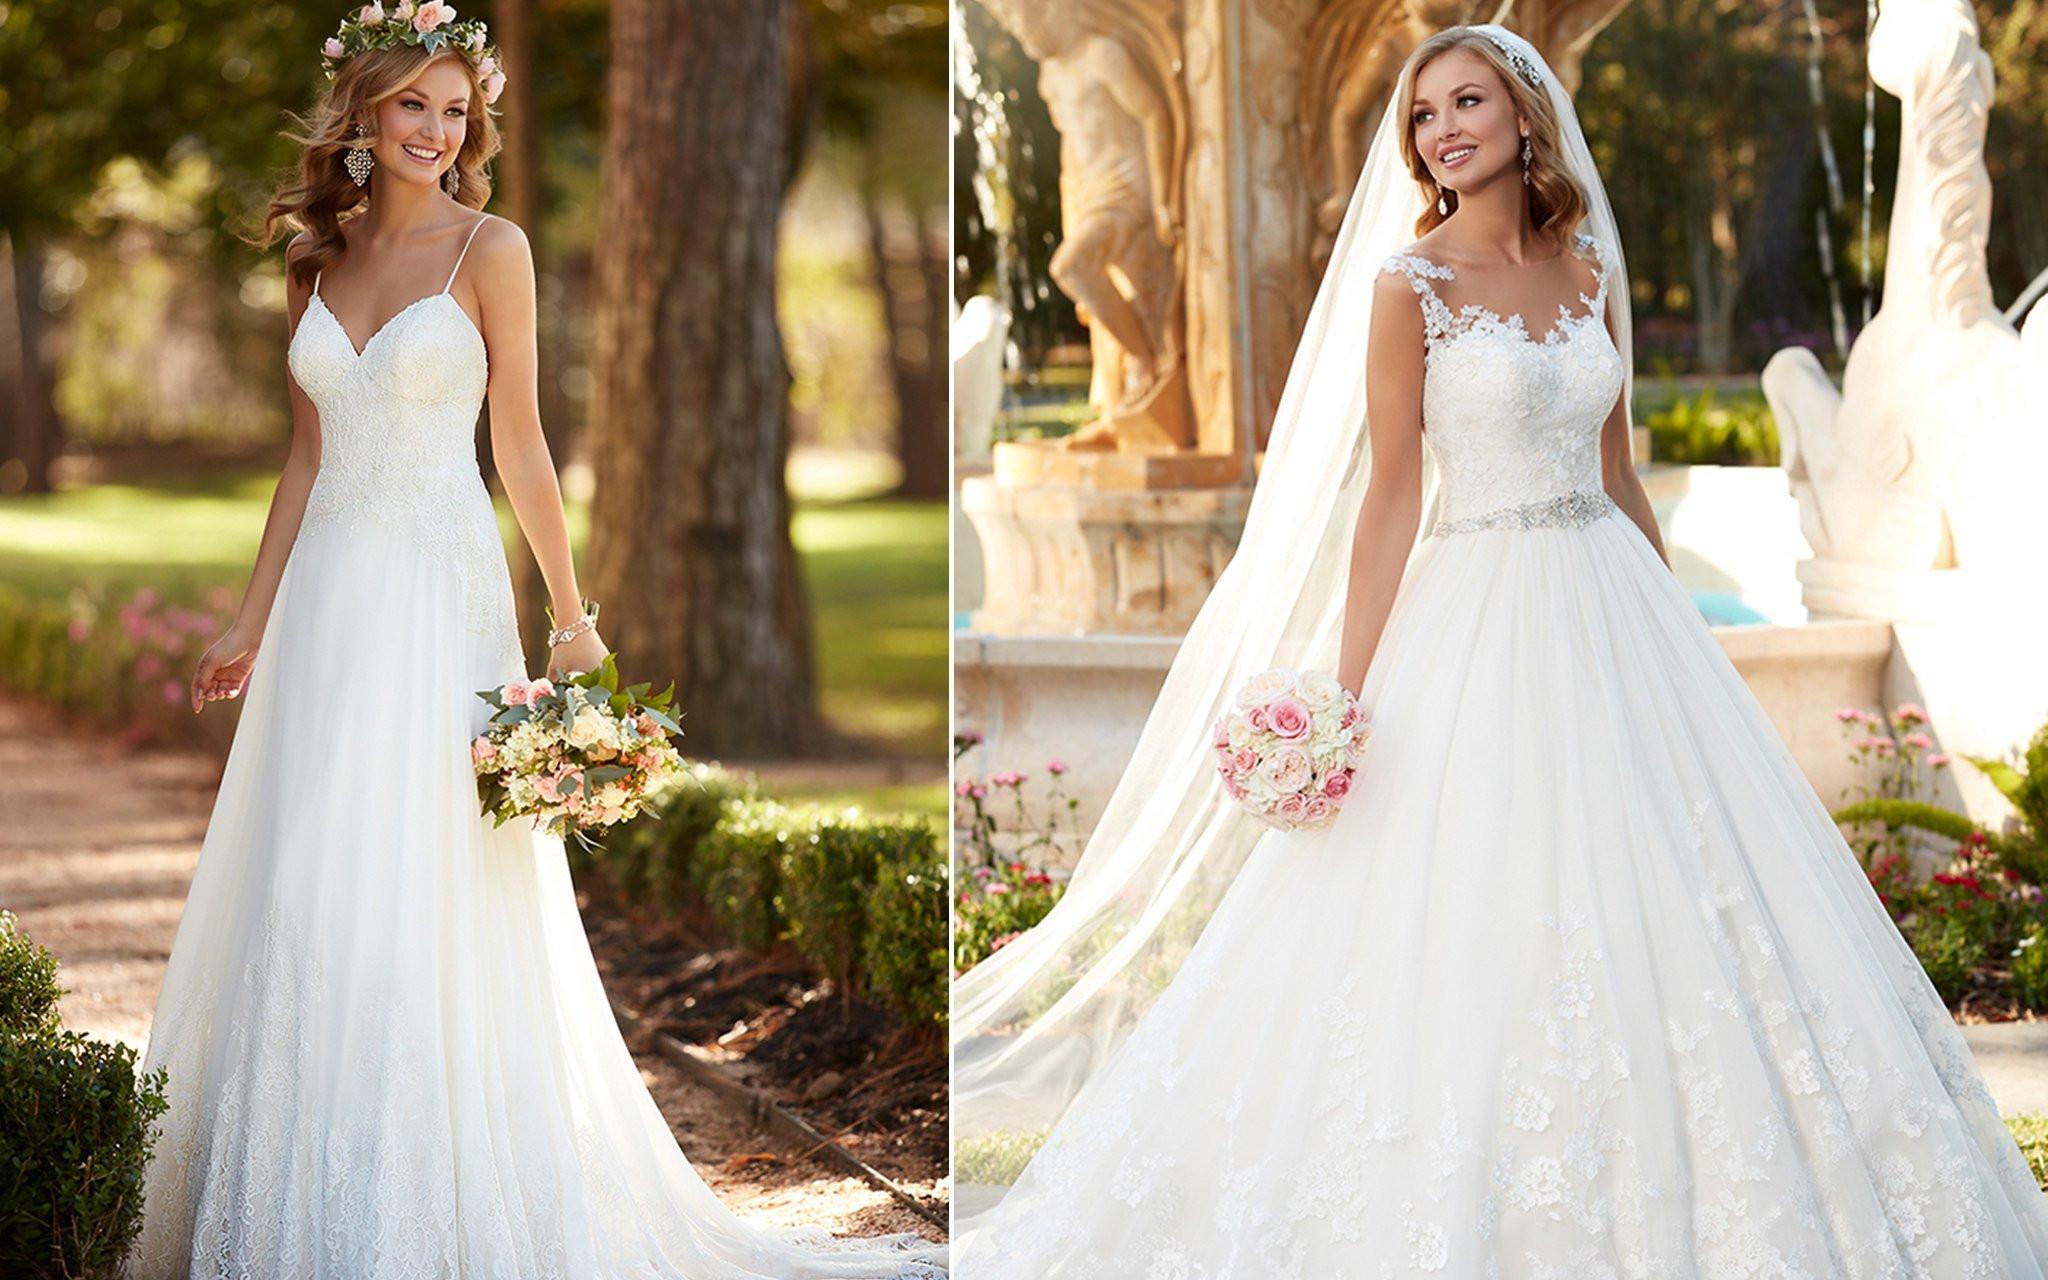 The New Bride In Barneveld Theperfectwedding Nl